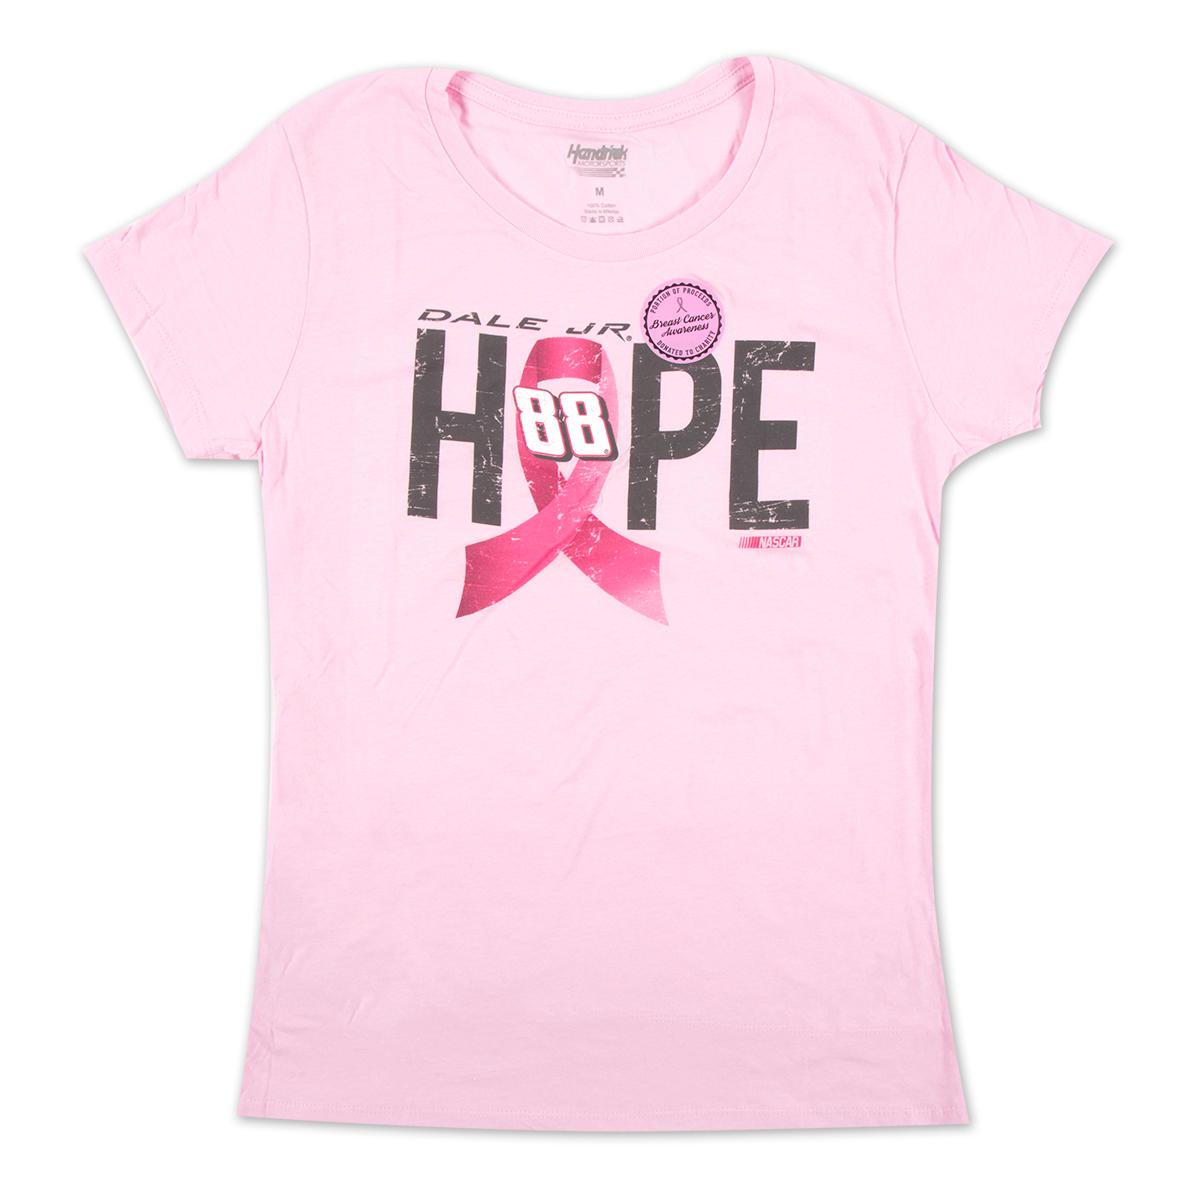 Dale Earnhardt, Jr. #88 Ladies Breast Cancer Awareness Hope T-Shirt